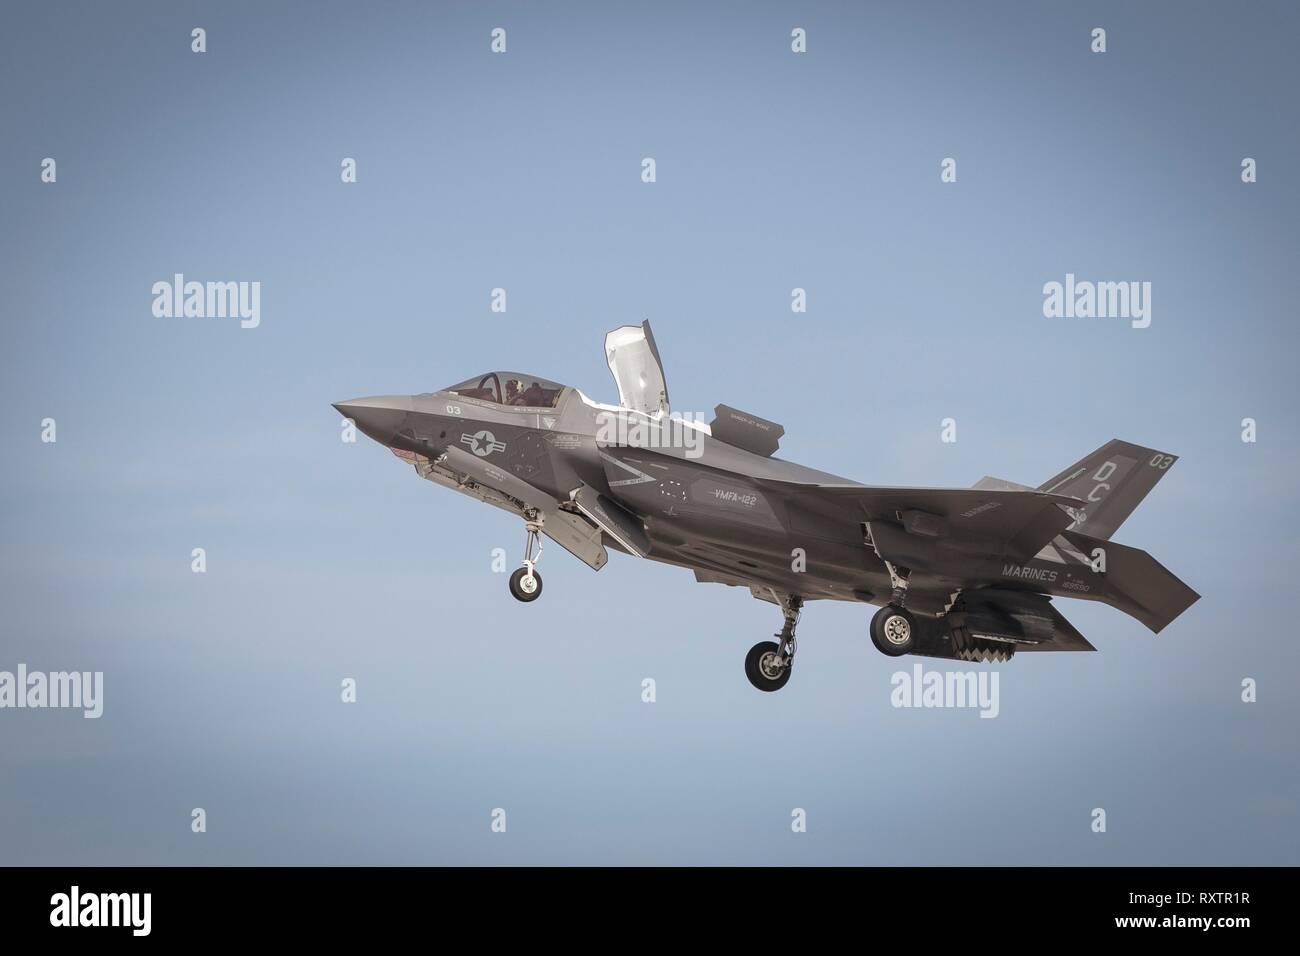 A U S  Marine Corps F-35B Lightning II stealth fighter